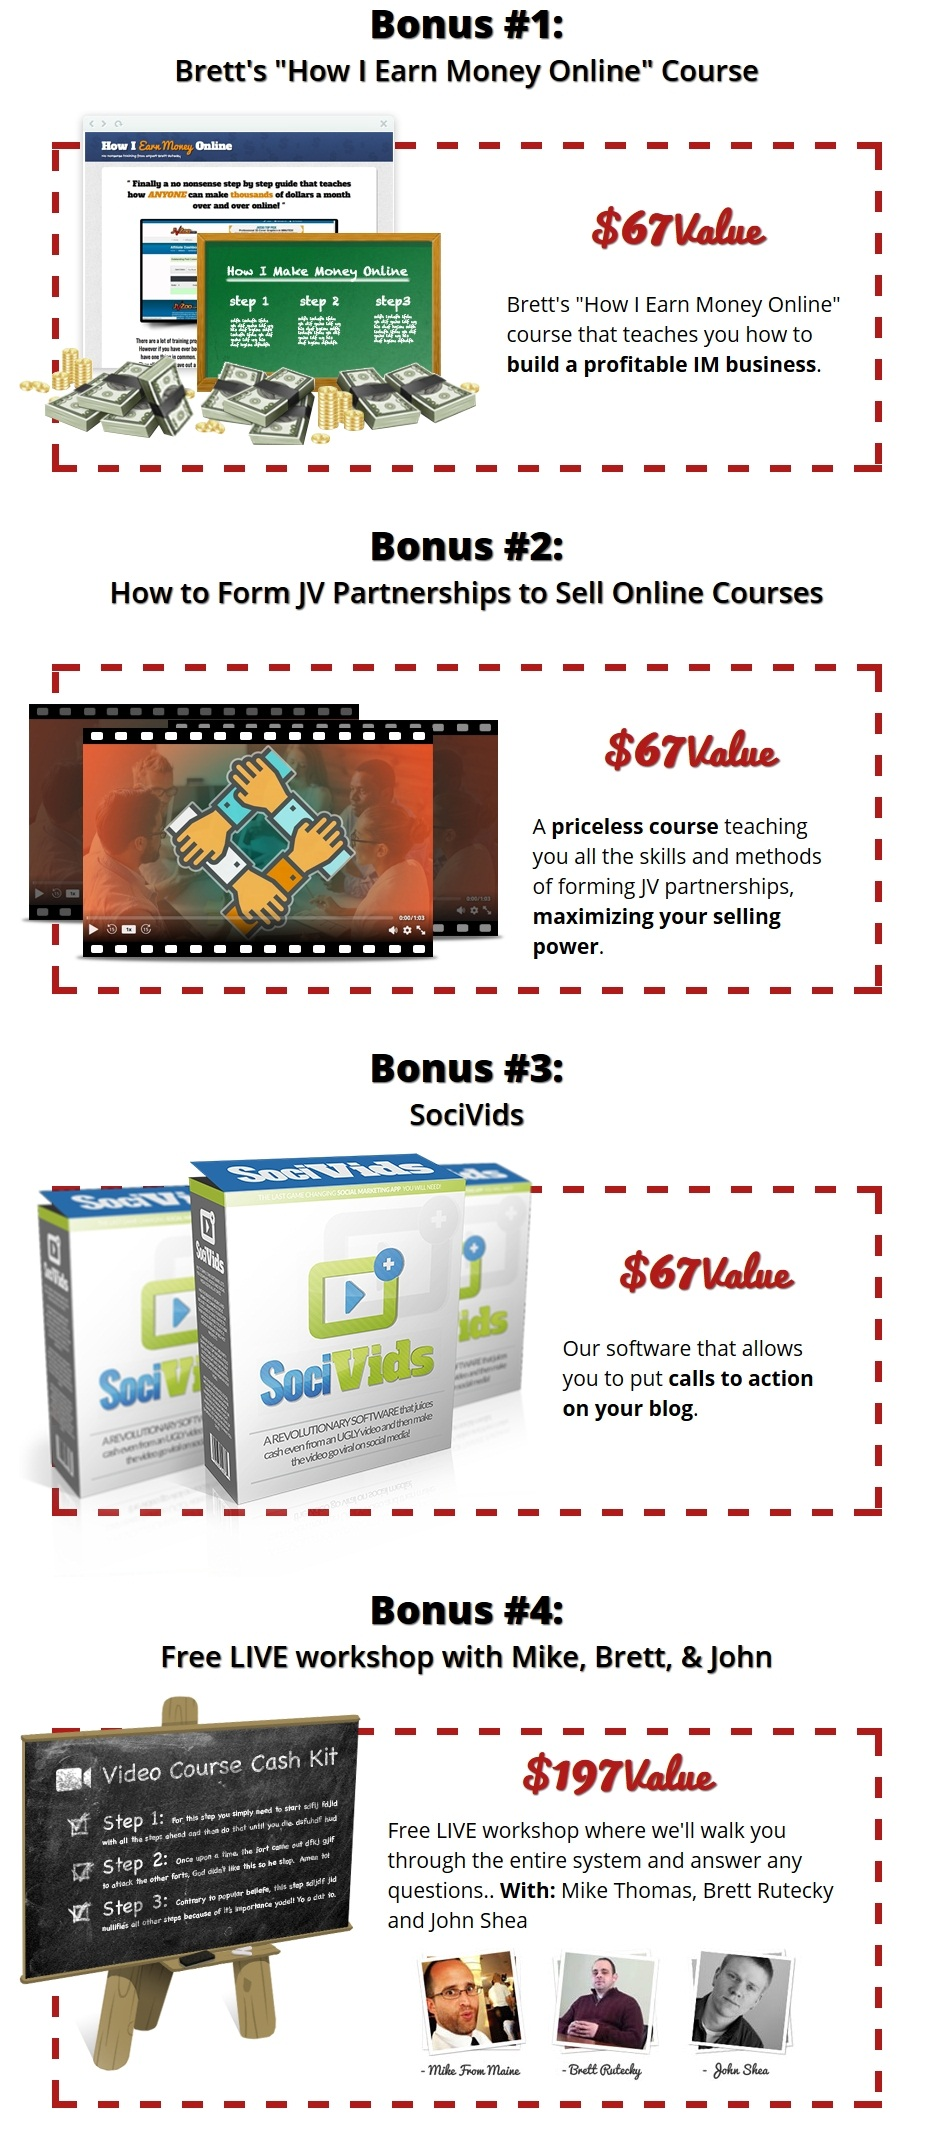 Video Course Cash Kit Bonus